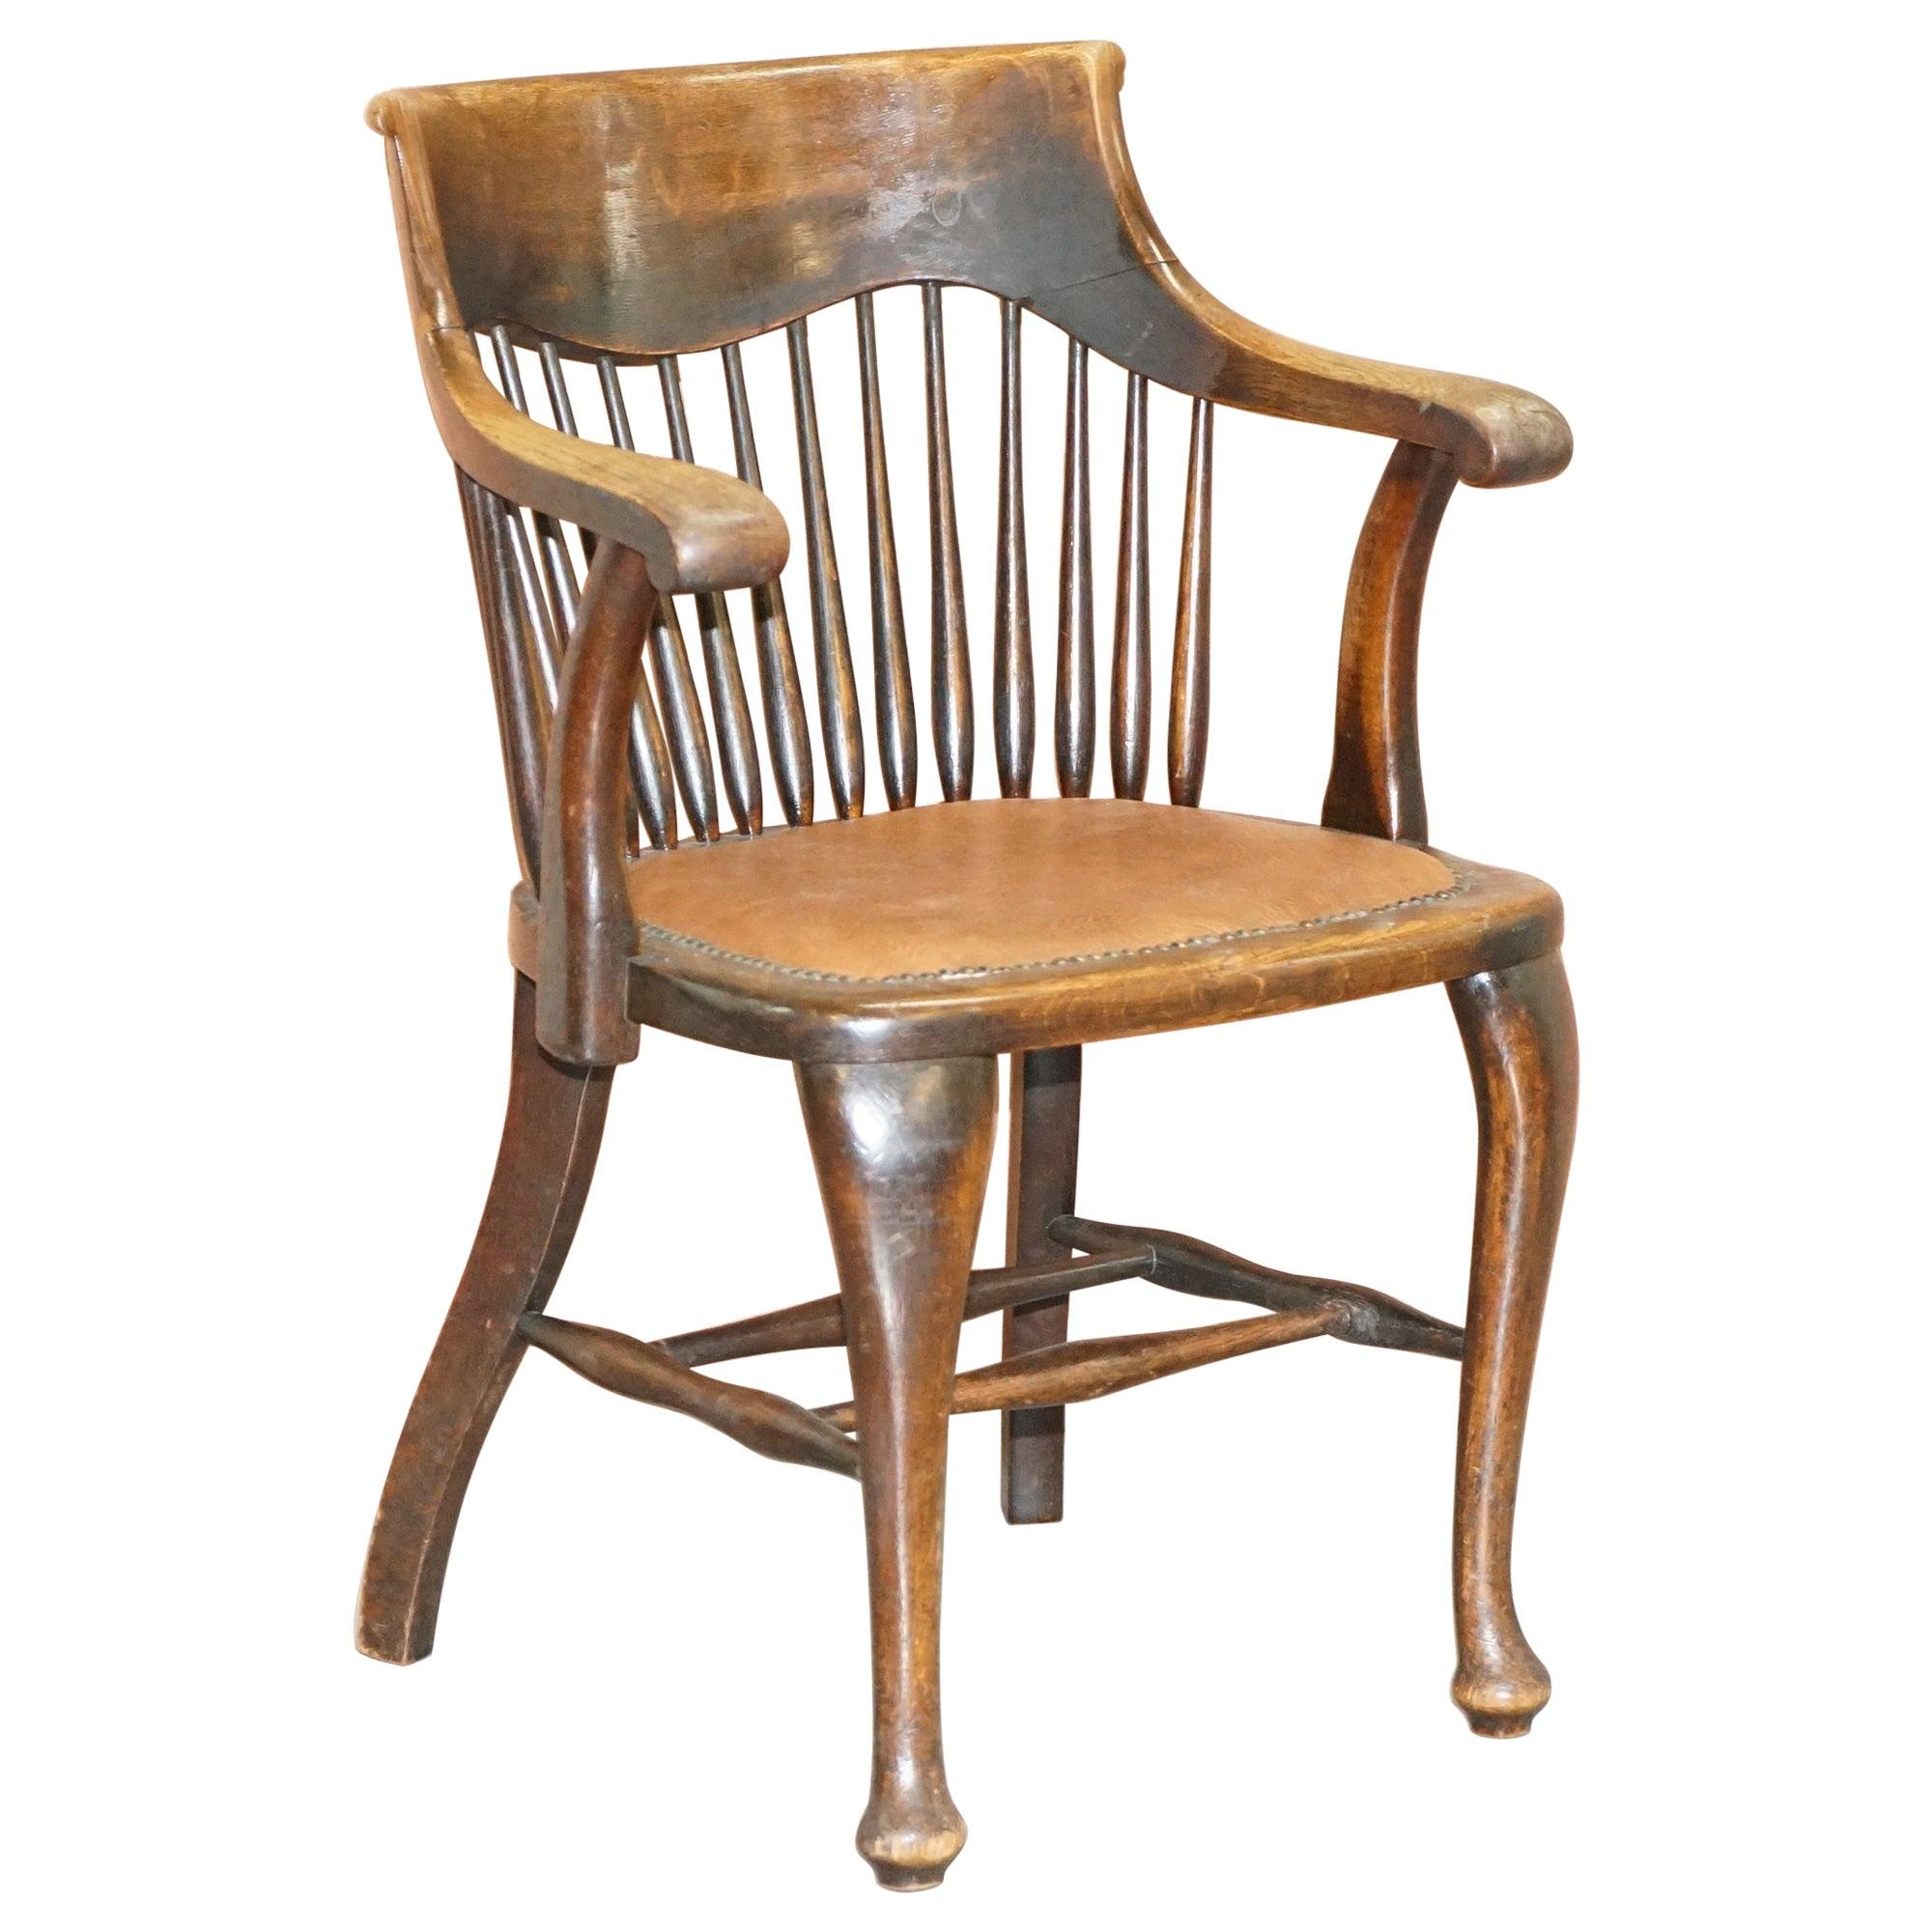 English Edwardian Ralph Johnson Oak Spindle Back Captains Office Desk Armchair